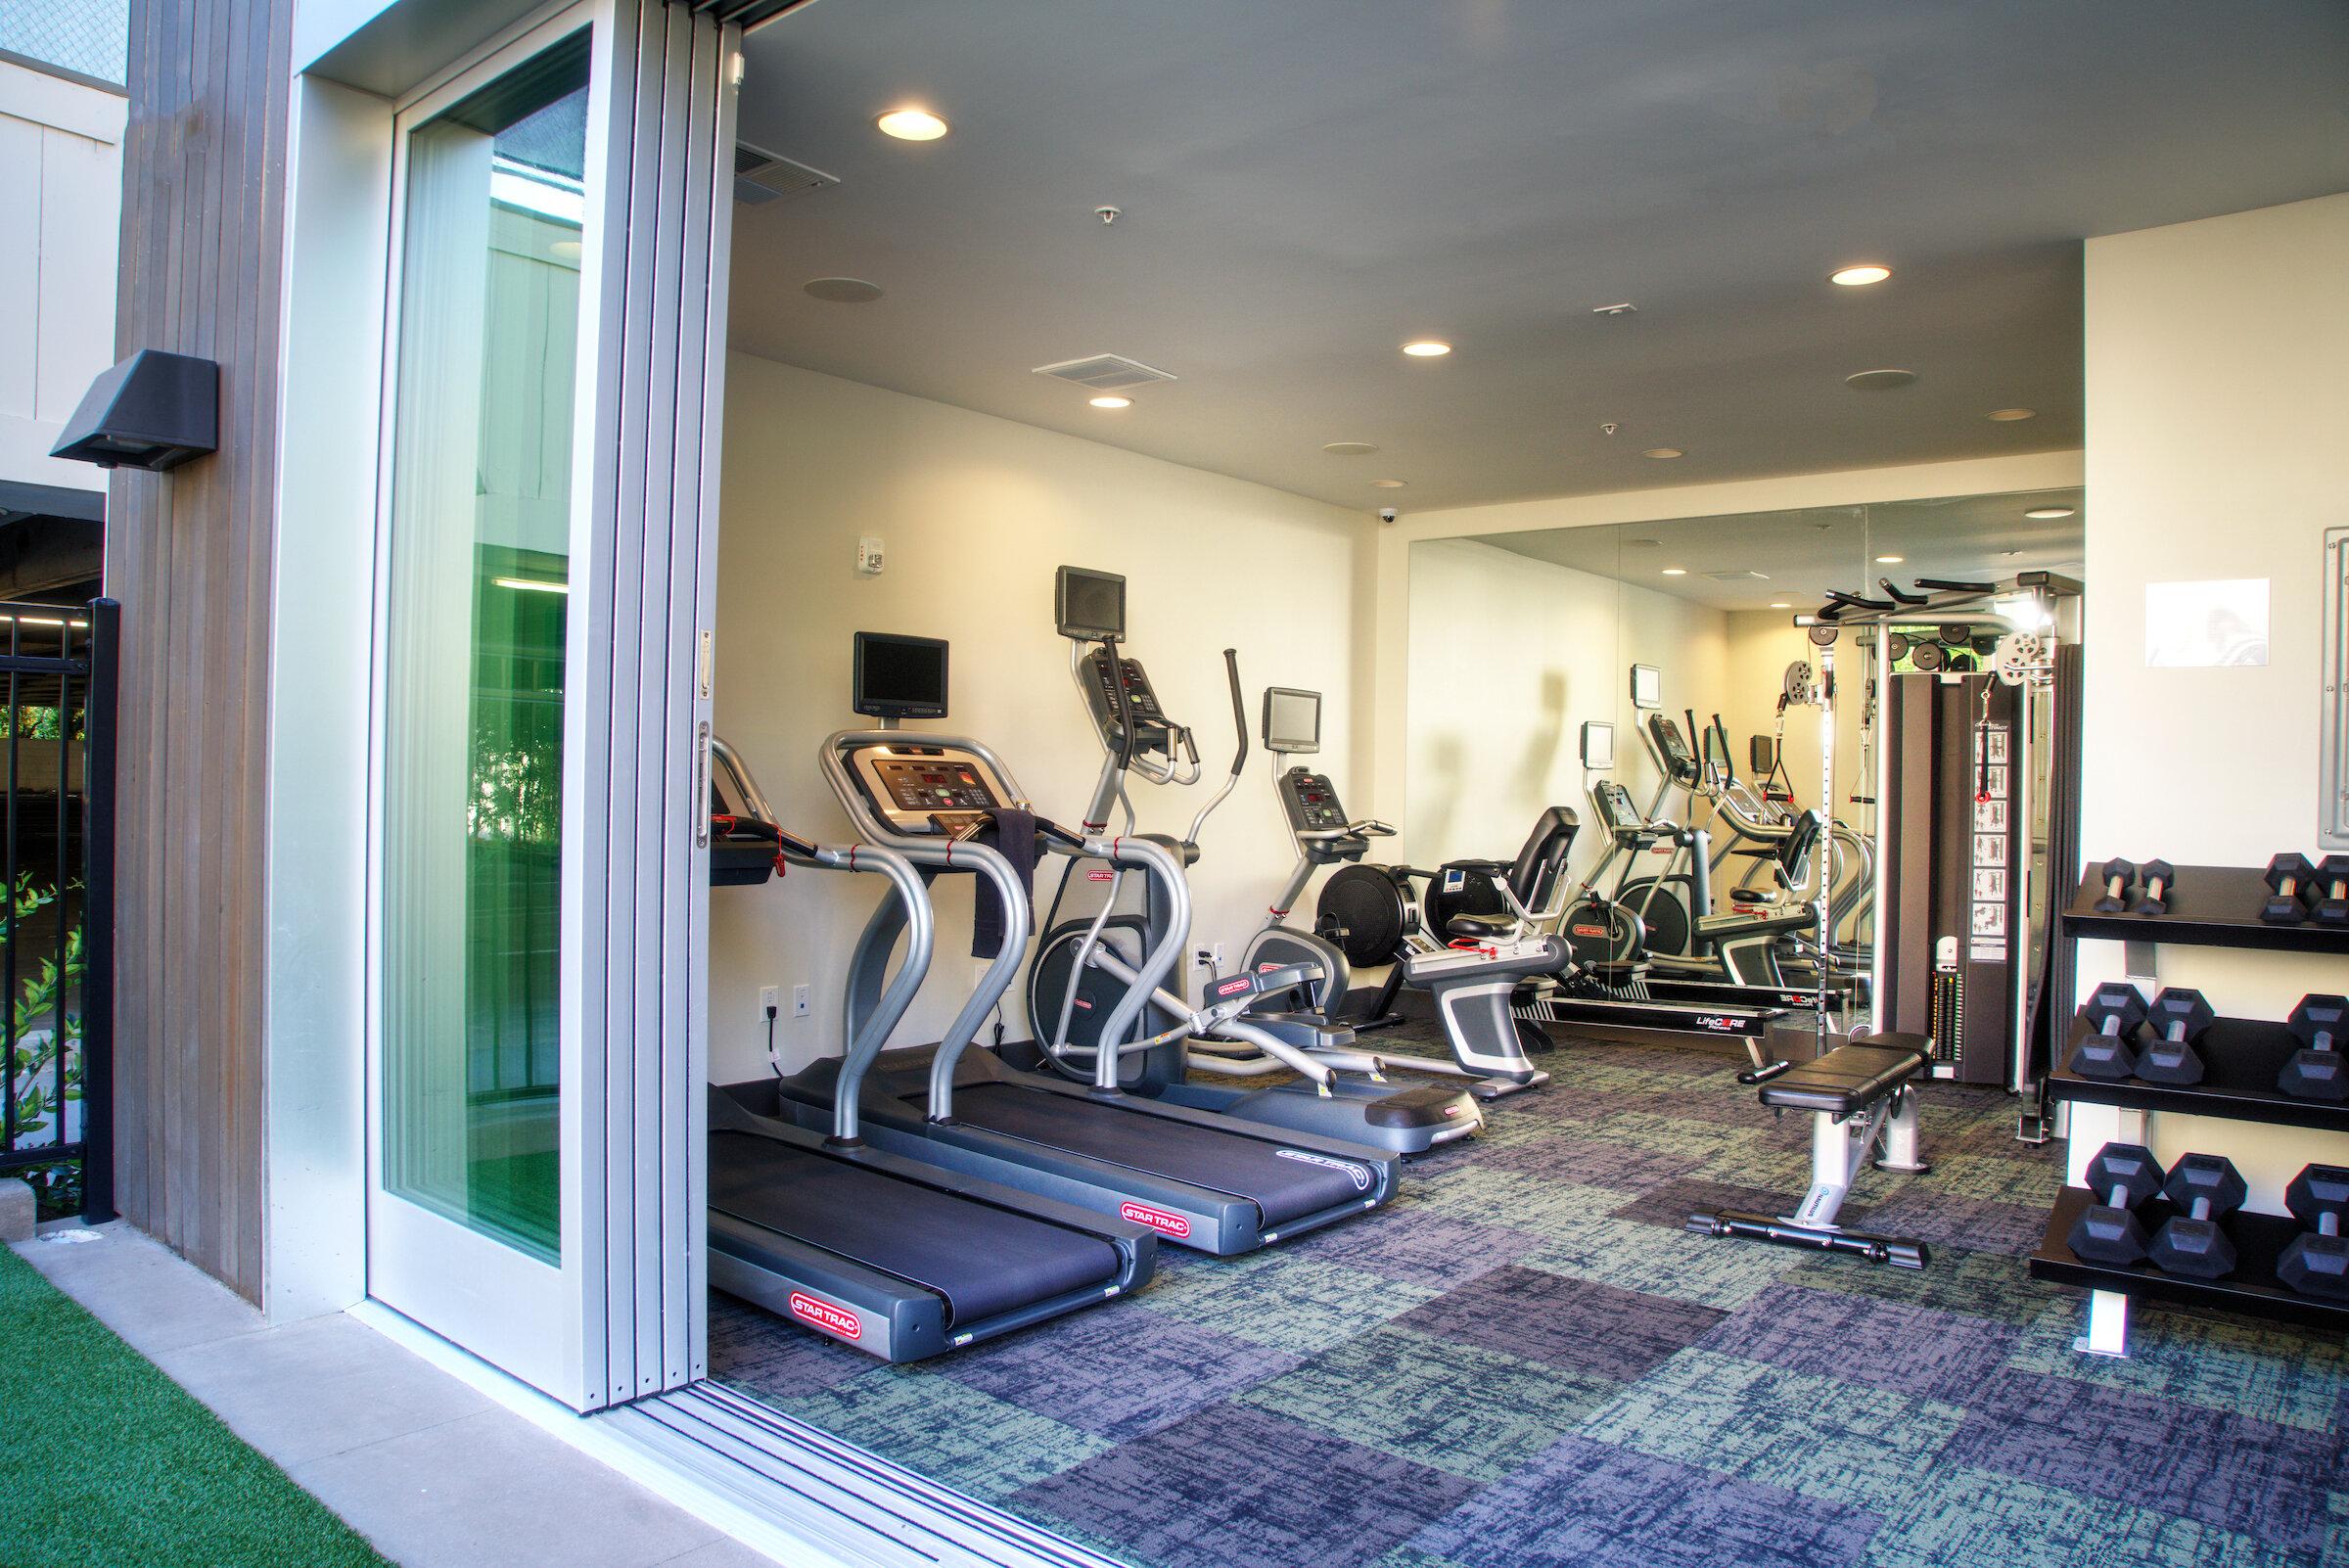 Sharon Green Menlo Park_Clubhouse with Indoor Outdoor Fitness Centerbaa_190926_1702_.jpg